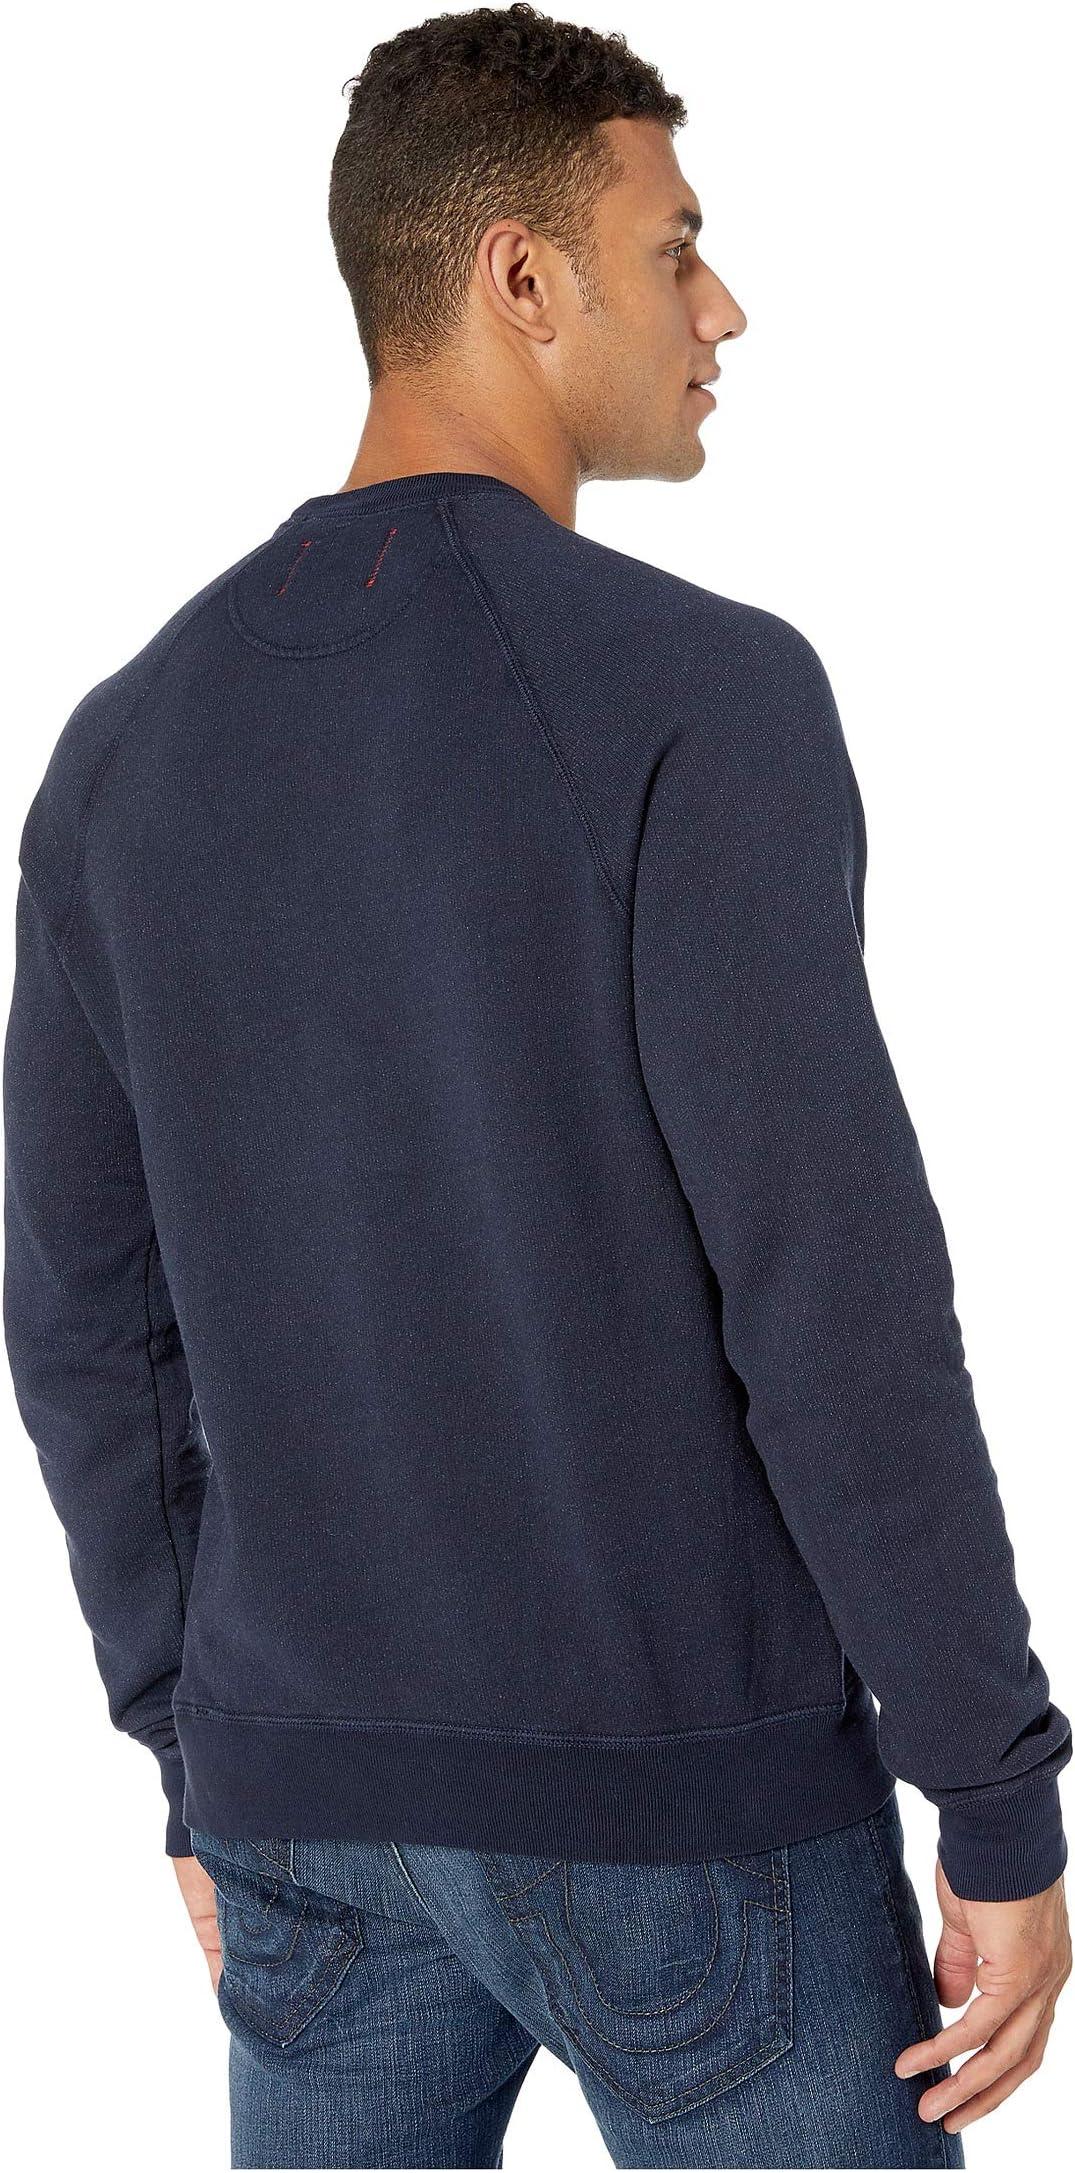 Hanes 1901 Heritage Fleece V-Notch Crew Neck Sweatshirt mHYKr